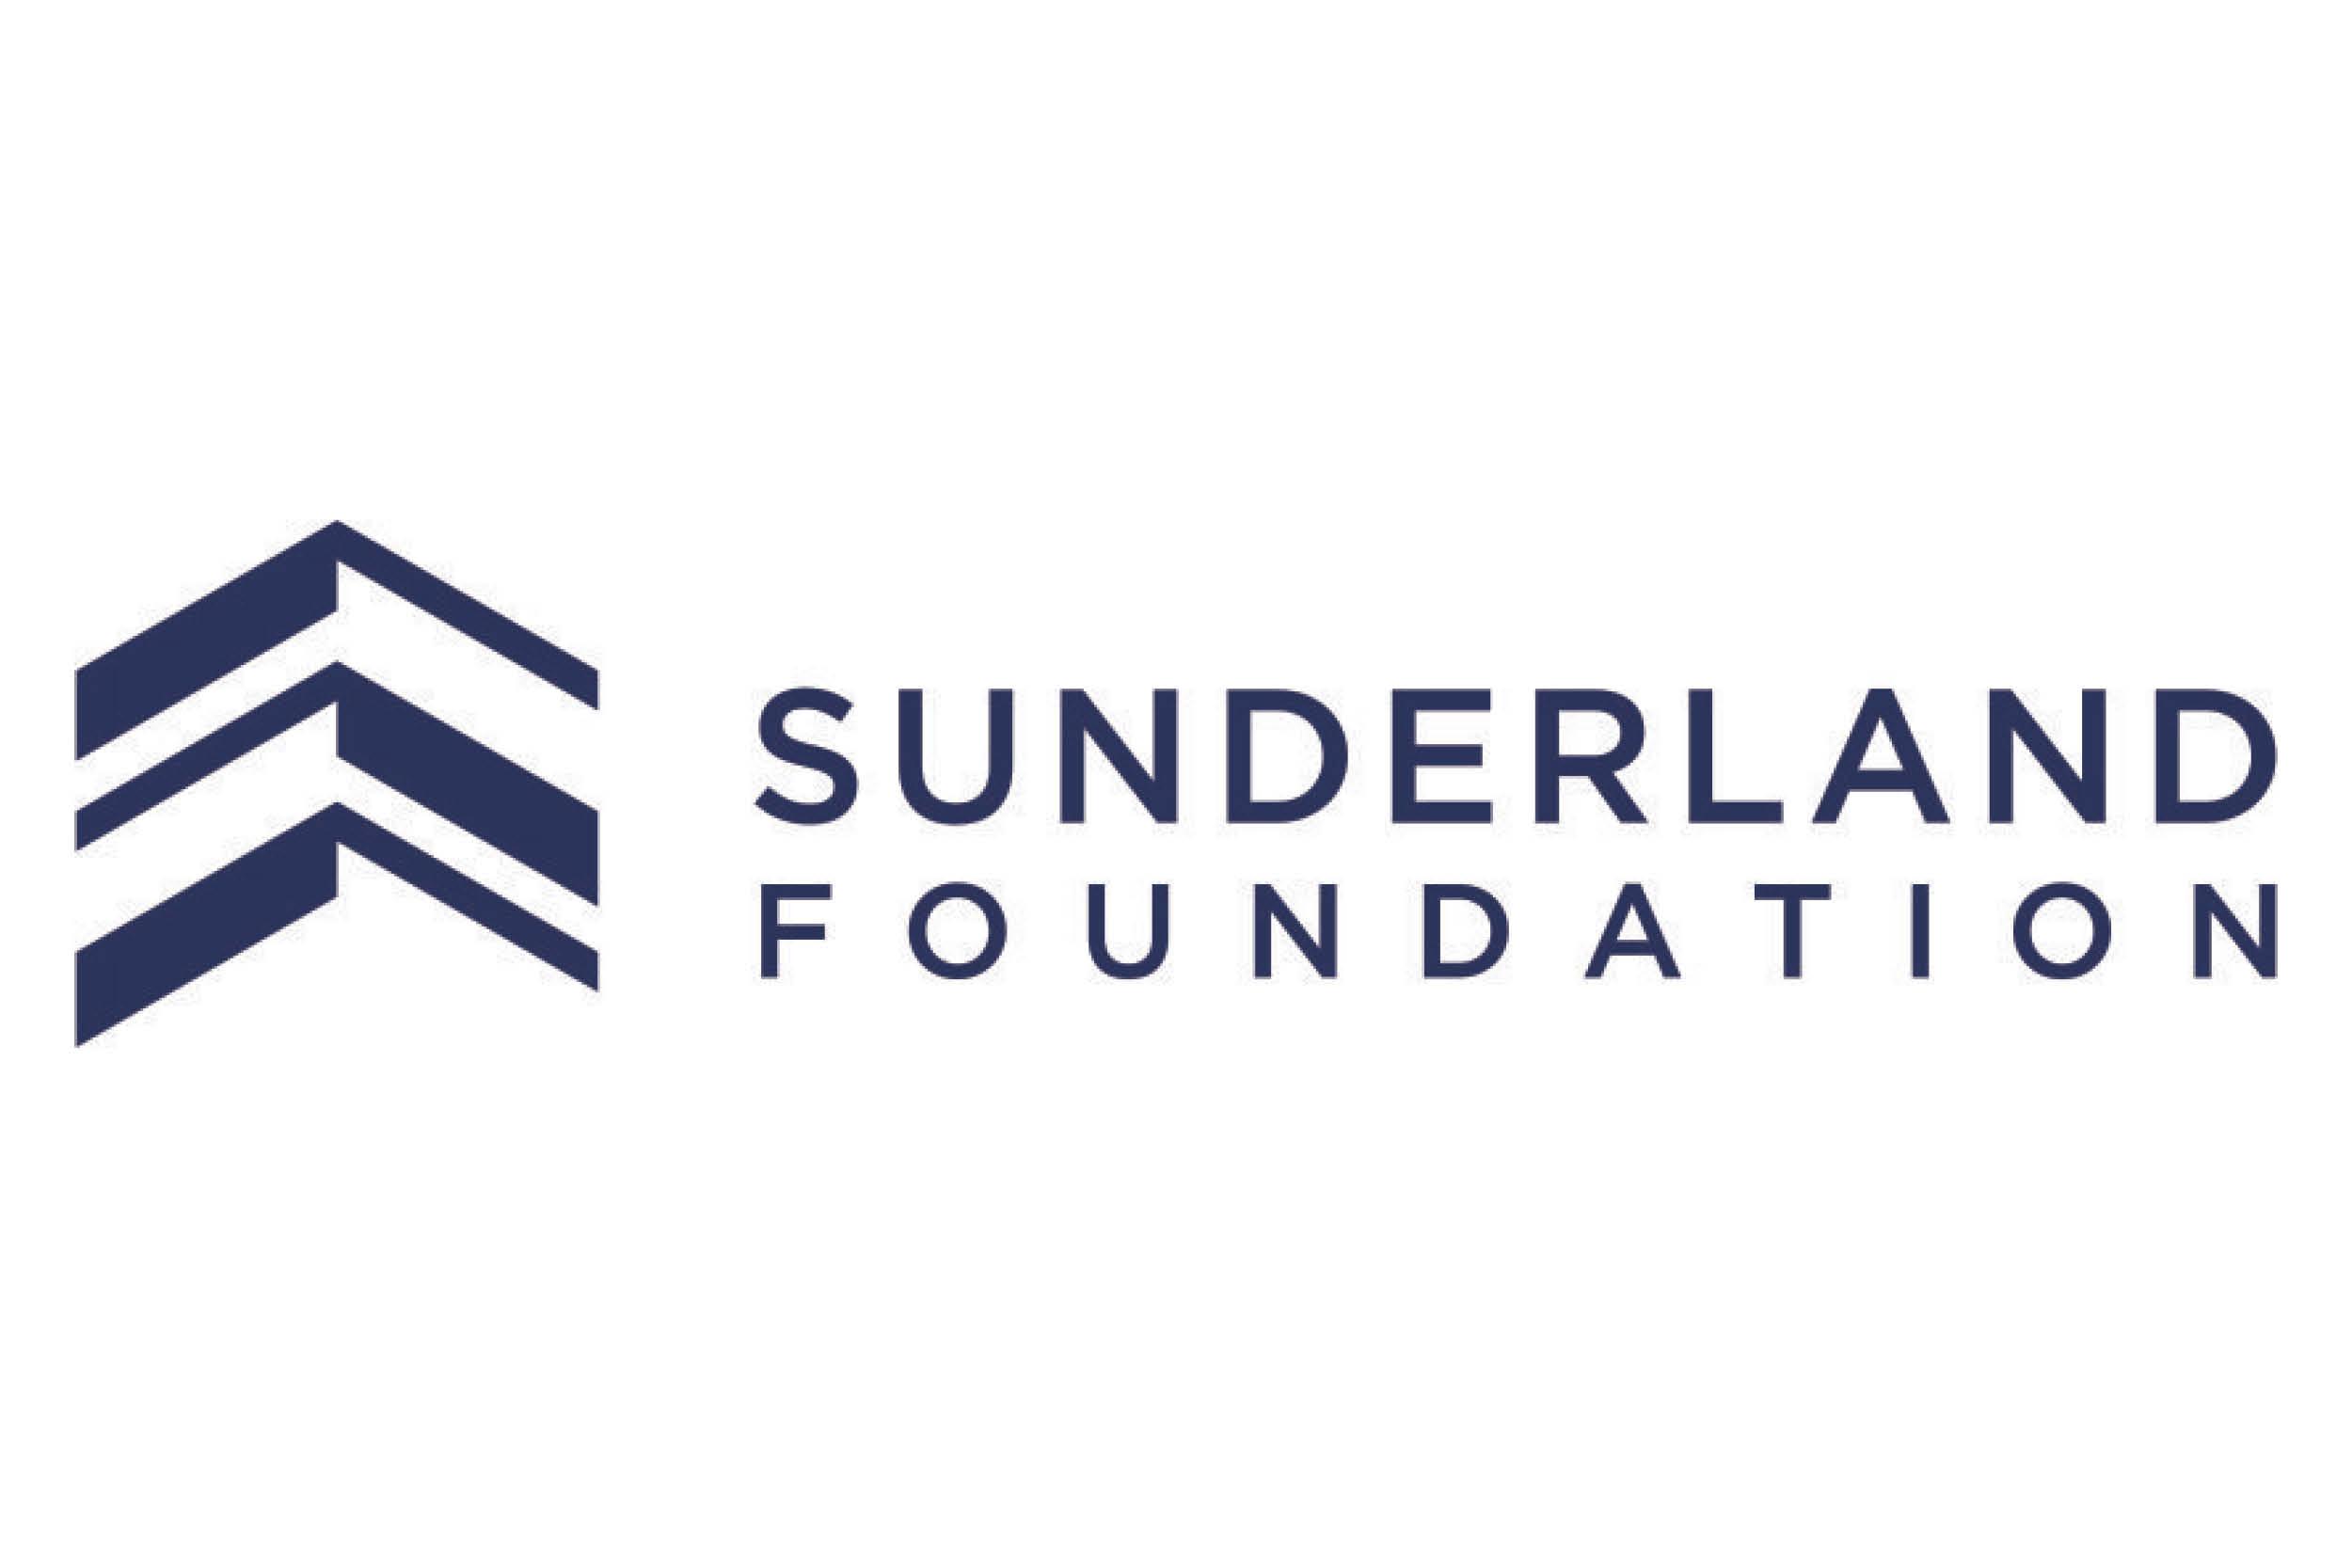 Sunderland Foundation_Half_600x400